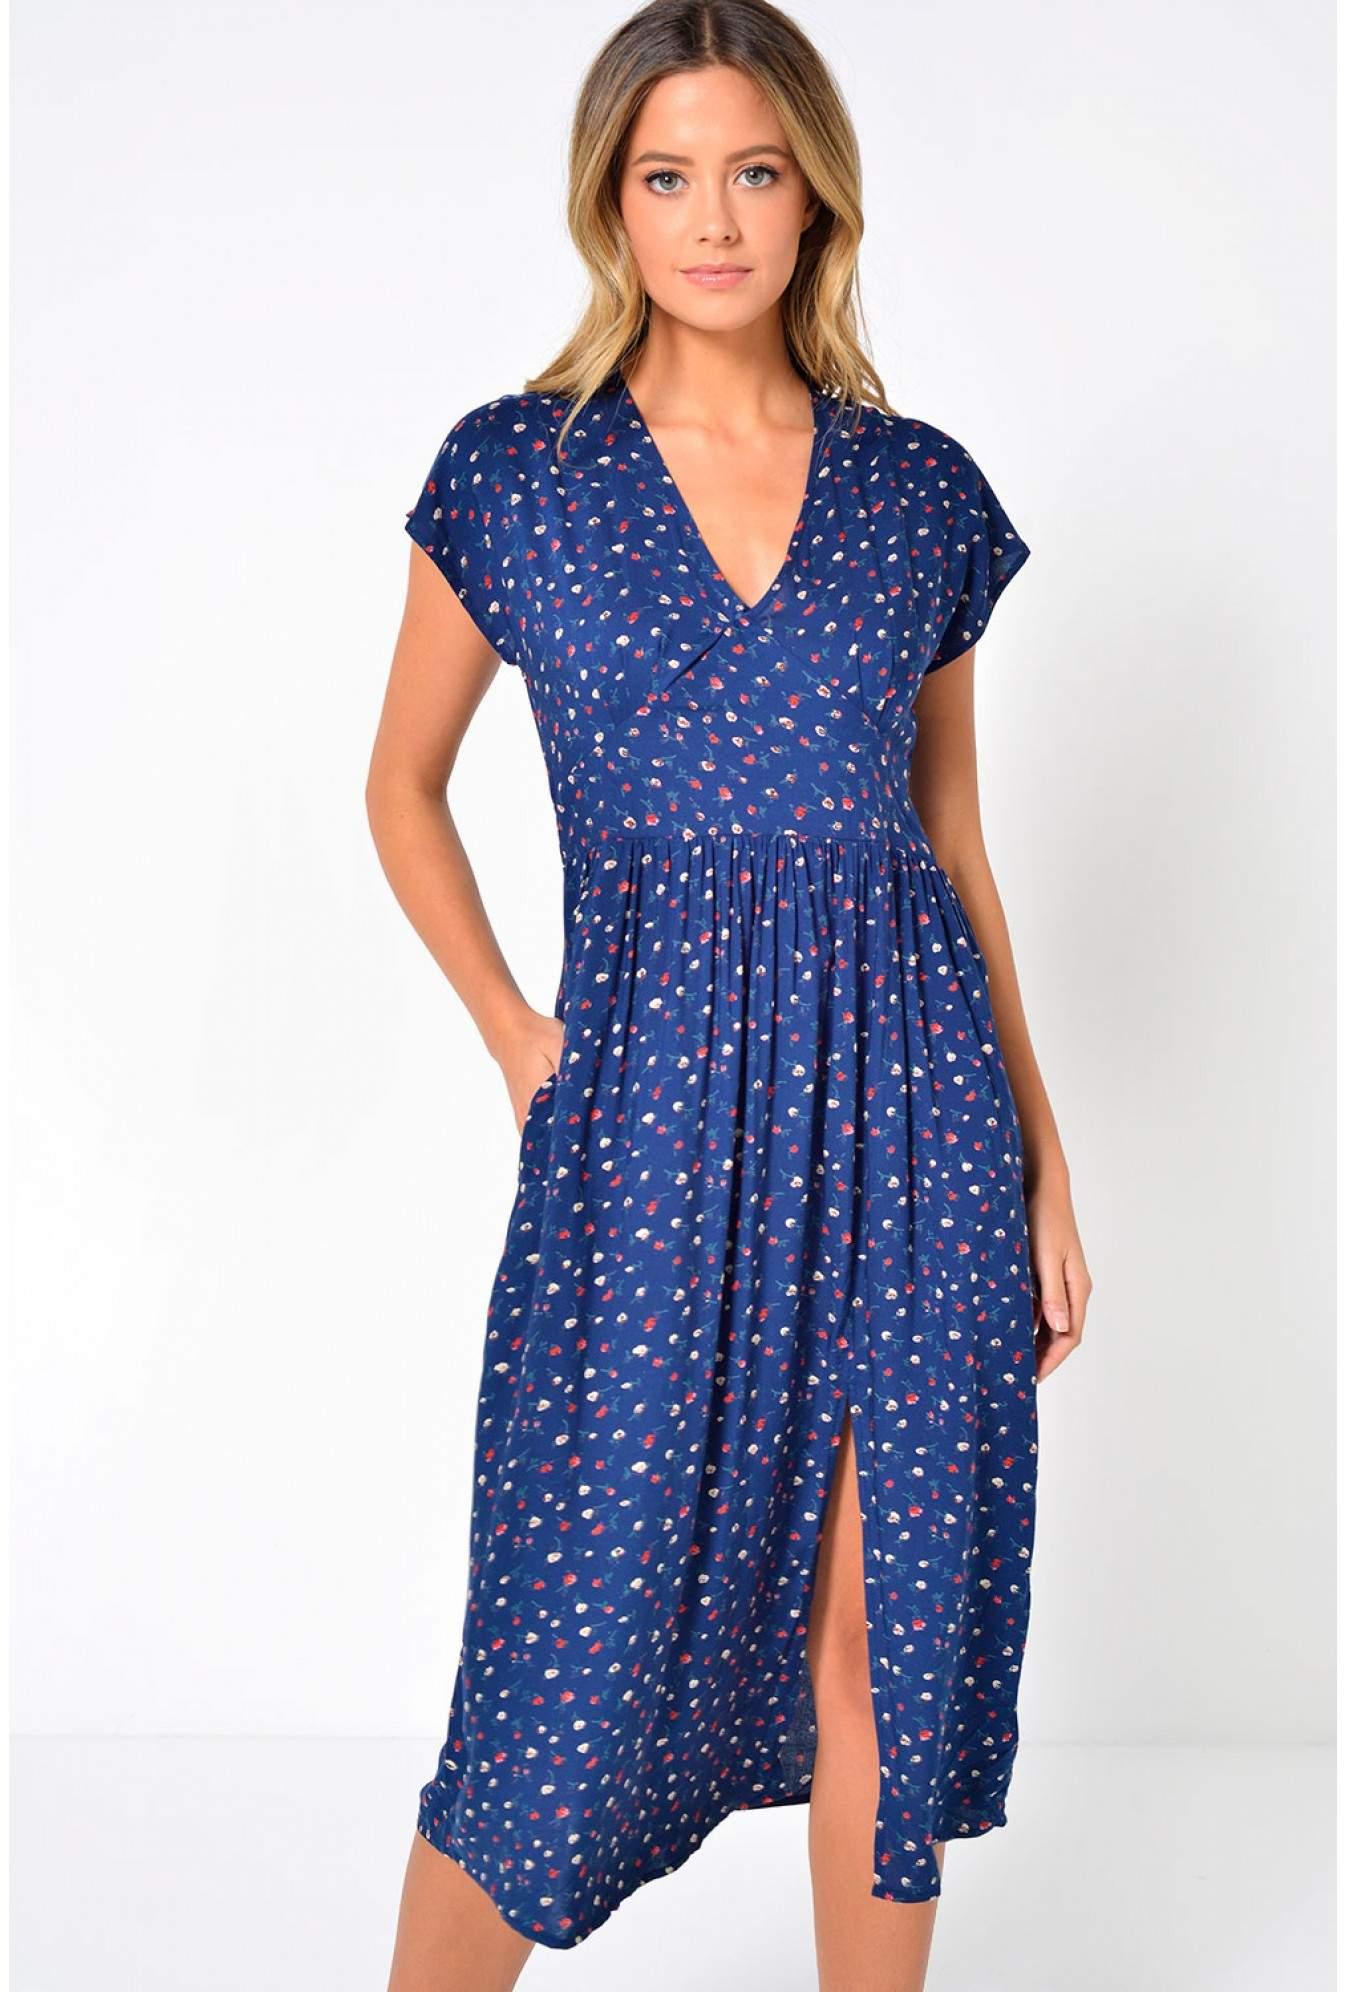 75e6899c5 Louche Unity Rosebudy Dress in Navy | iCLOTHING